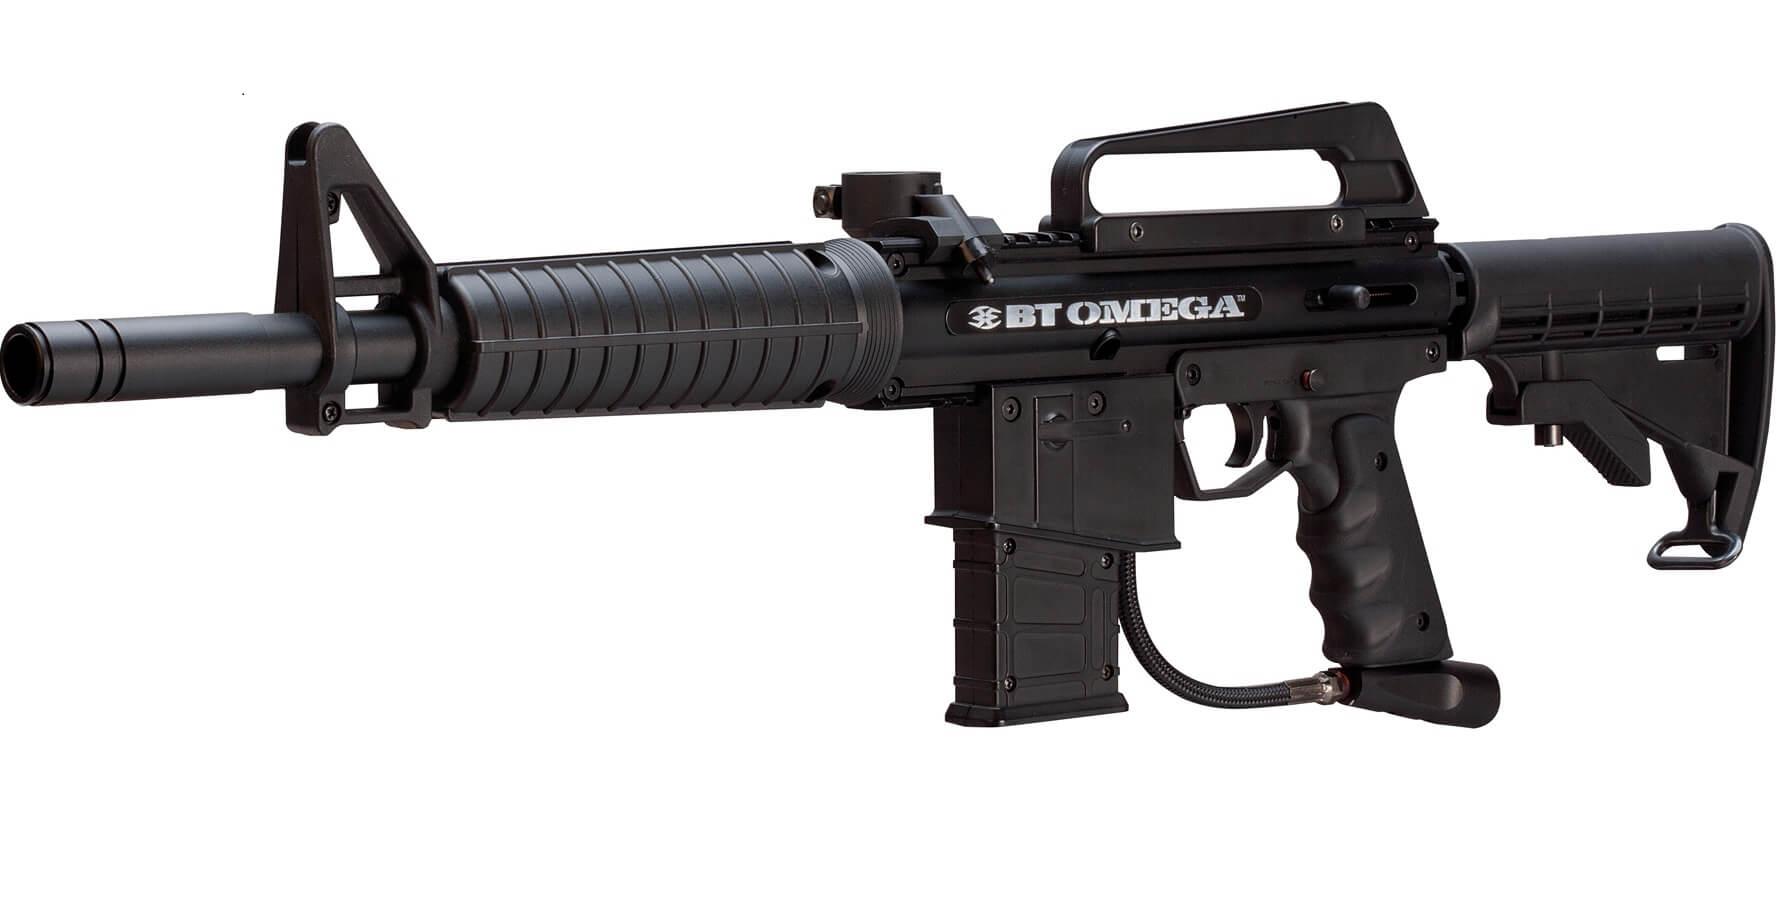 pb_bt_omegablk_17041_empire_bt_omega_paintball_gun_black_1